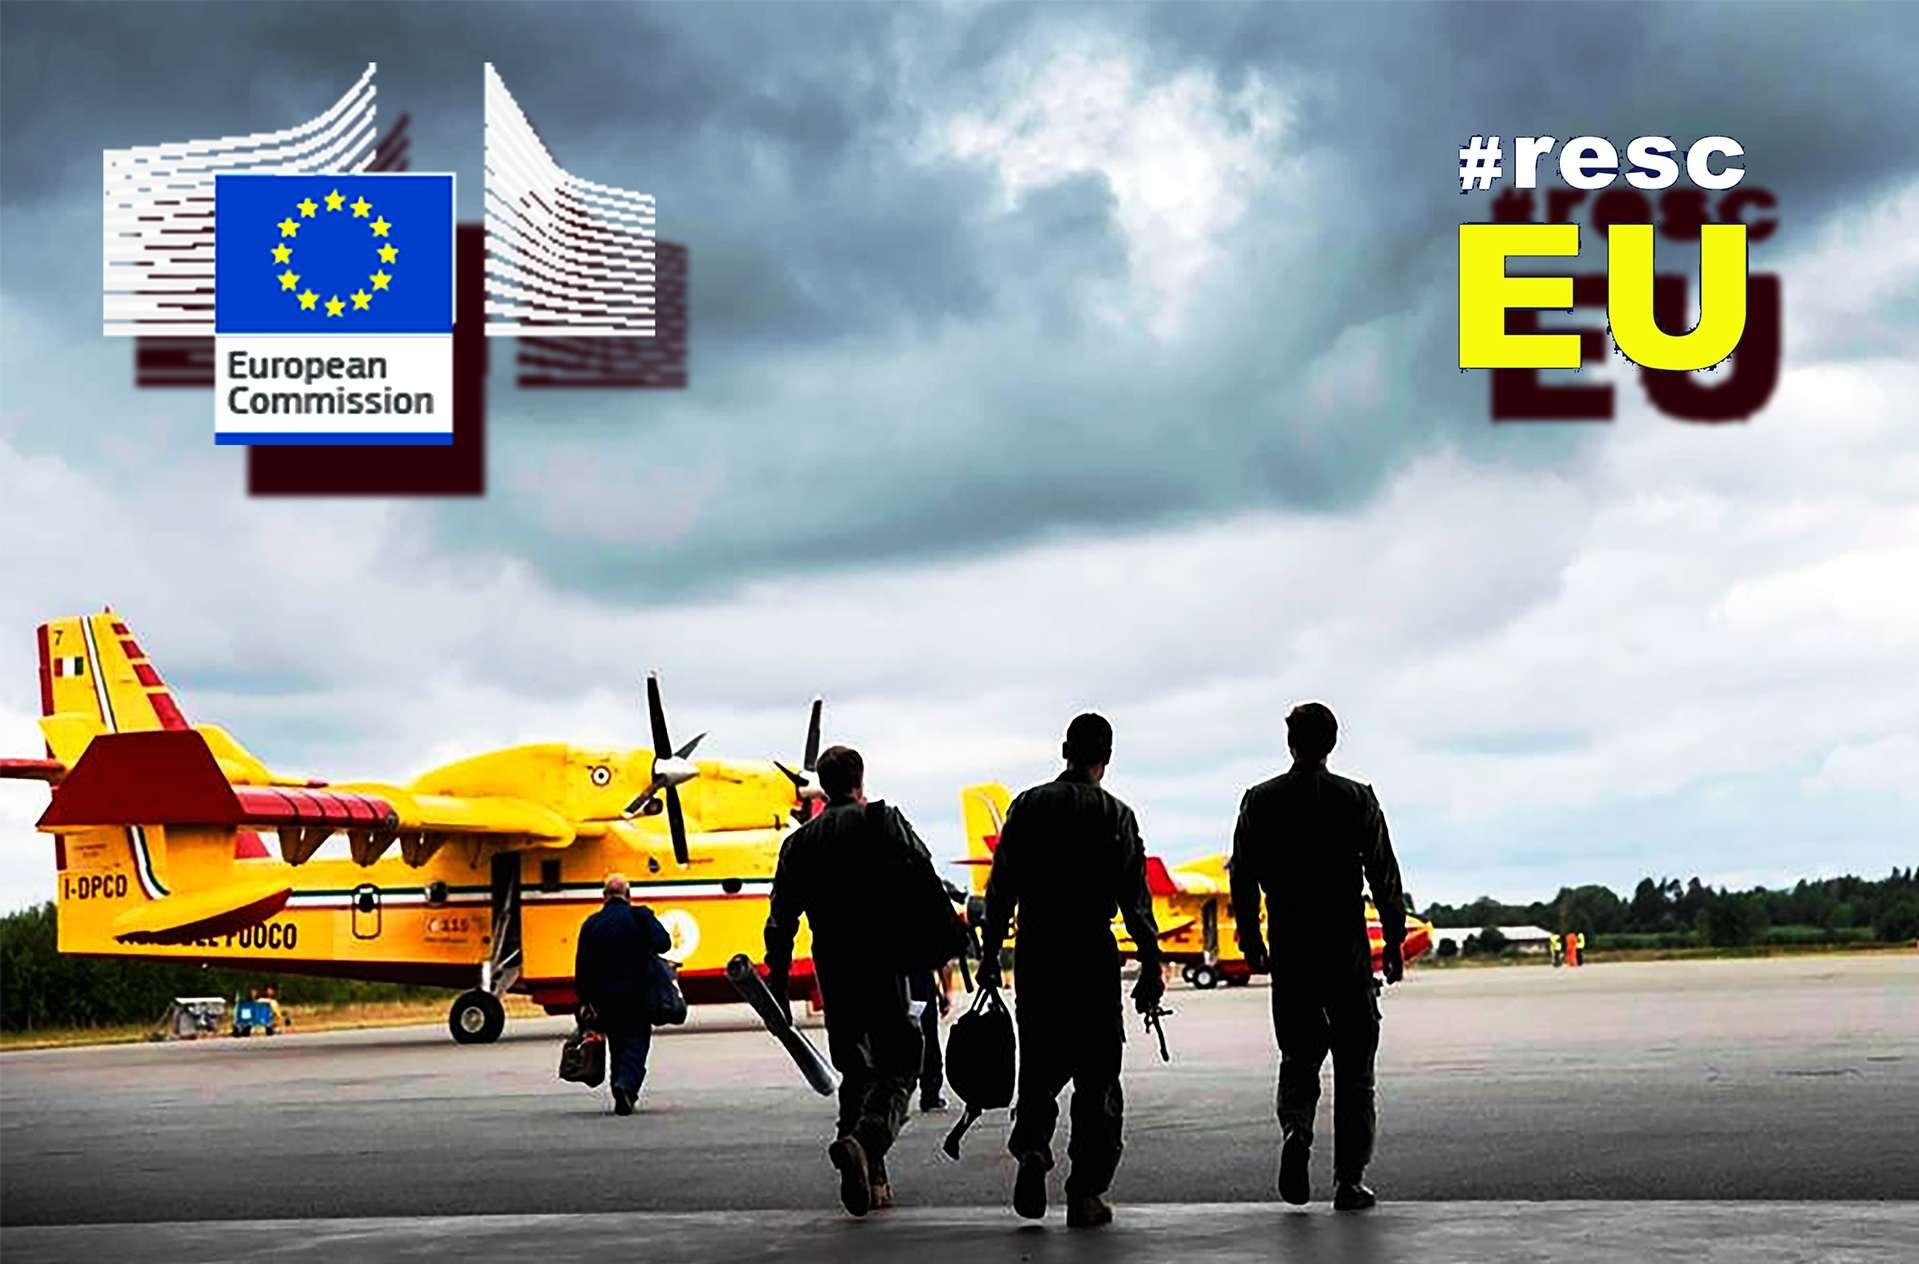 rescEU Ευρωπαϊκός Μηχανισμός Πολιτικής Προστασίας